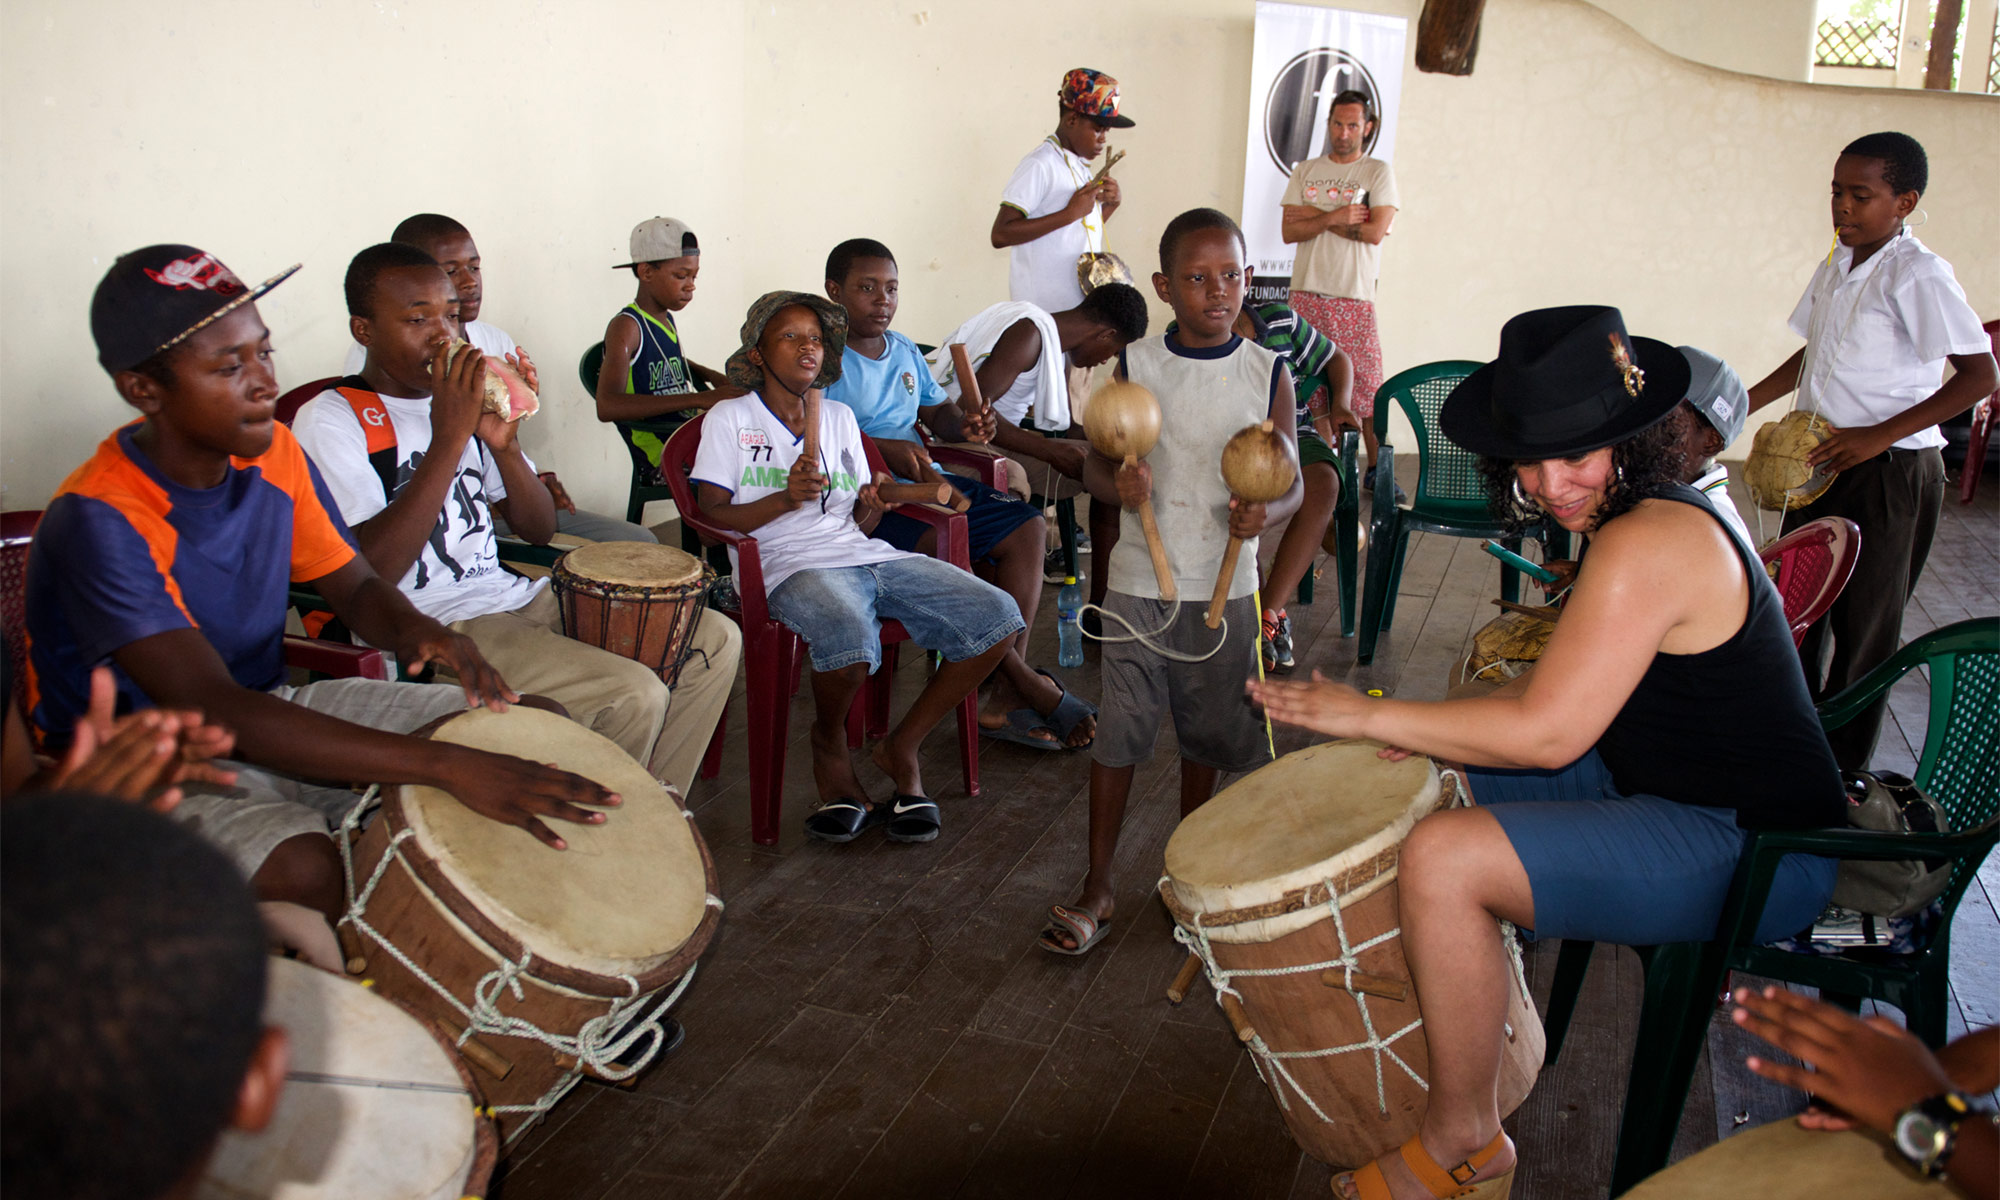 Establishment of the first Garifuna Cultural Festival and workshops in Livingston, Guatemala